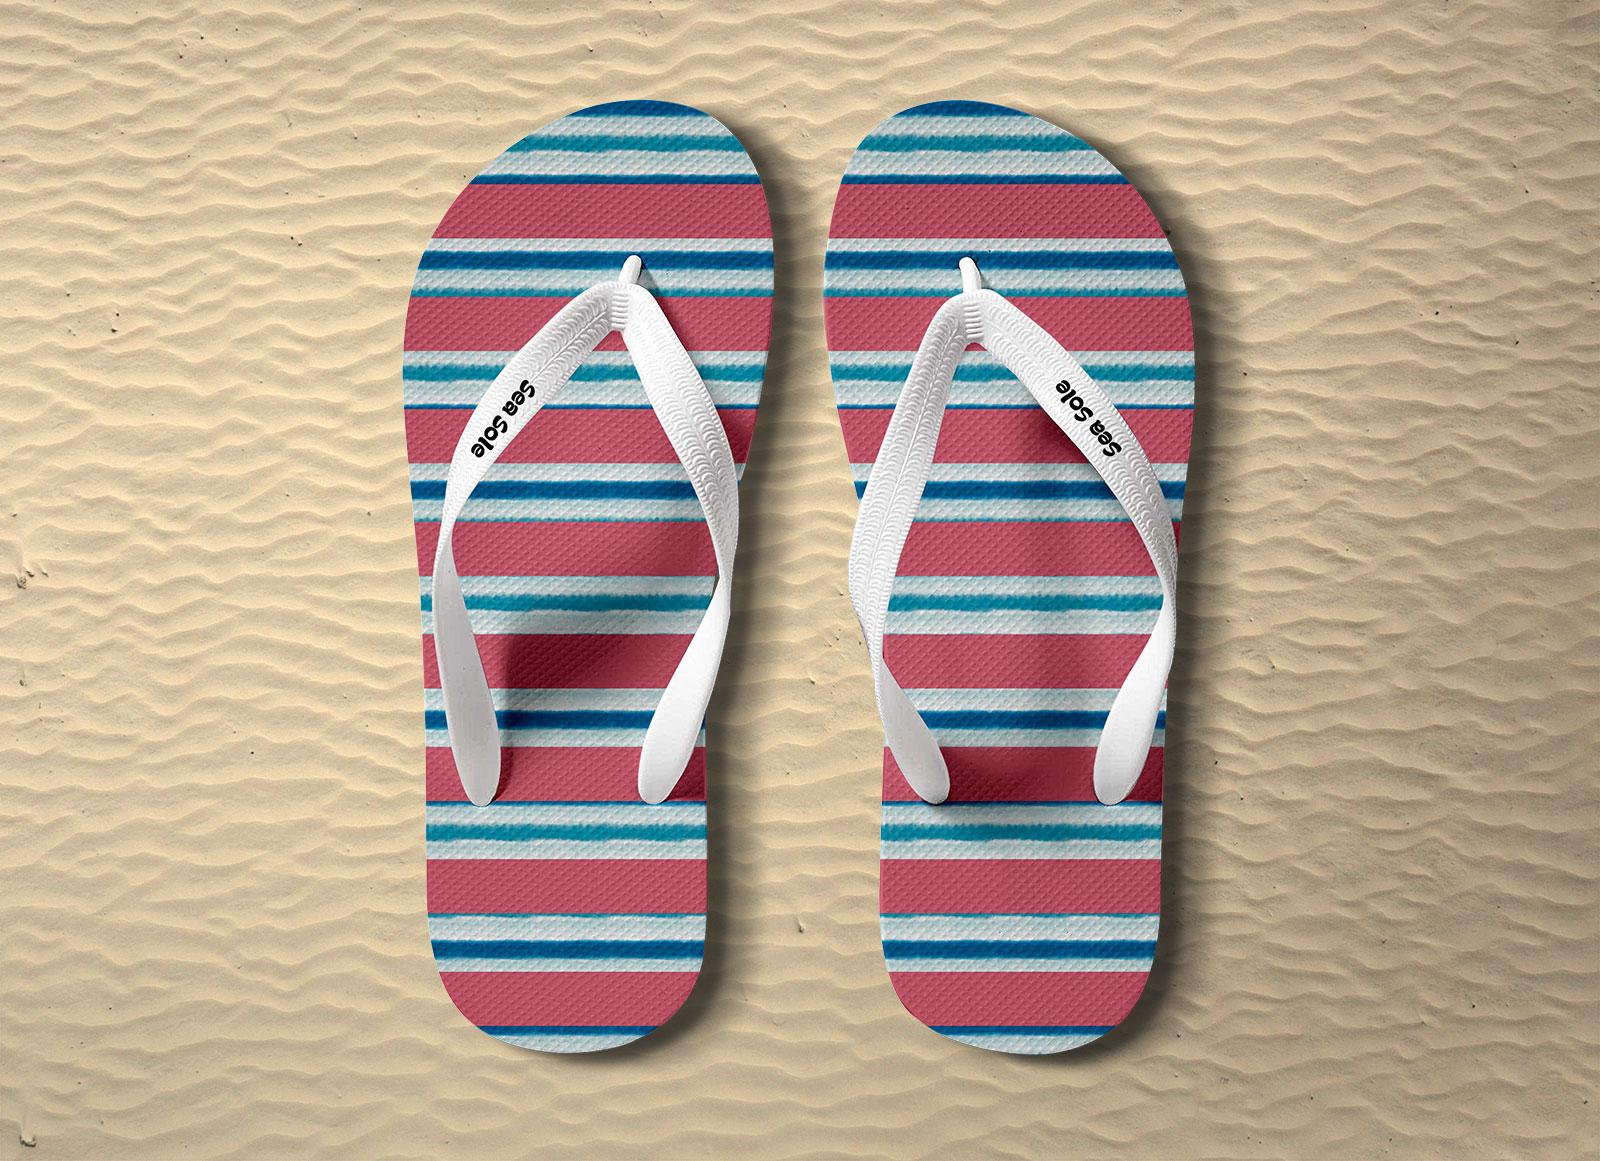 Free-Flip-Flops-Beach-Slippers-Mockup-PSD